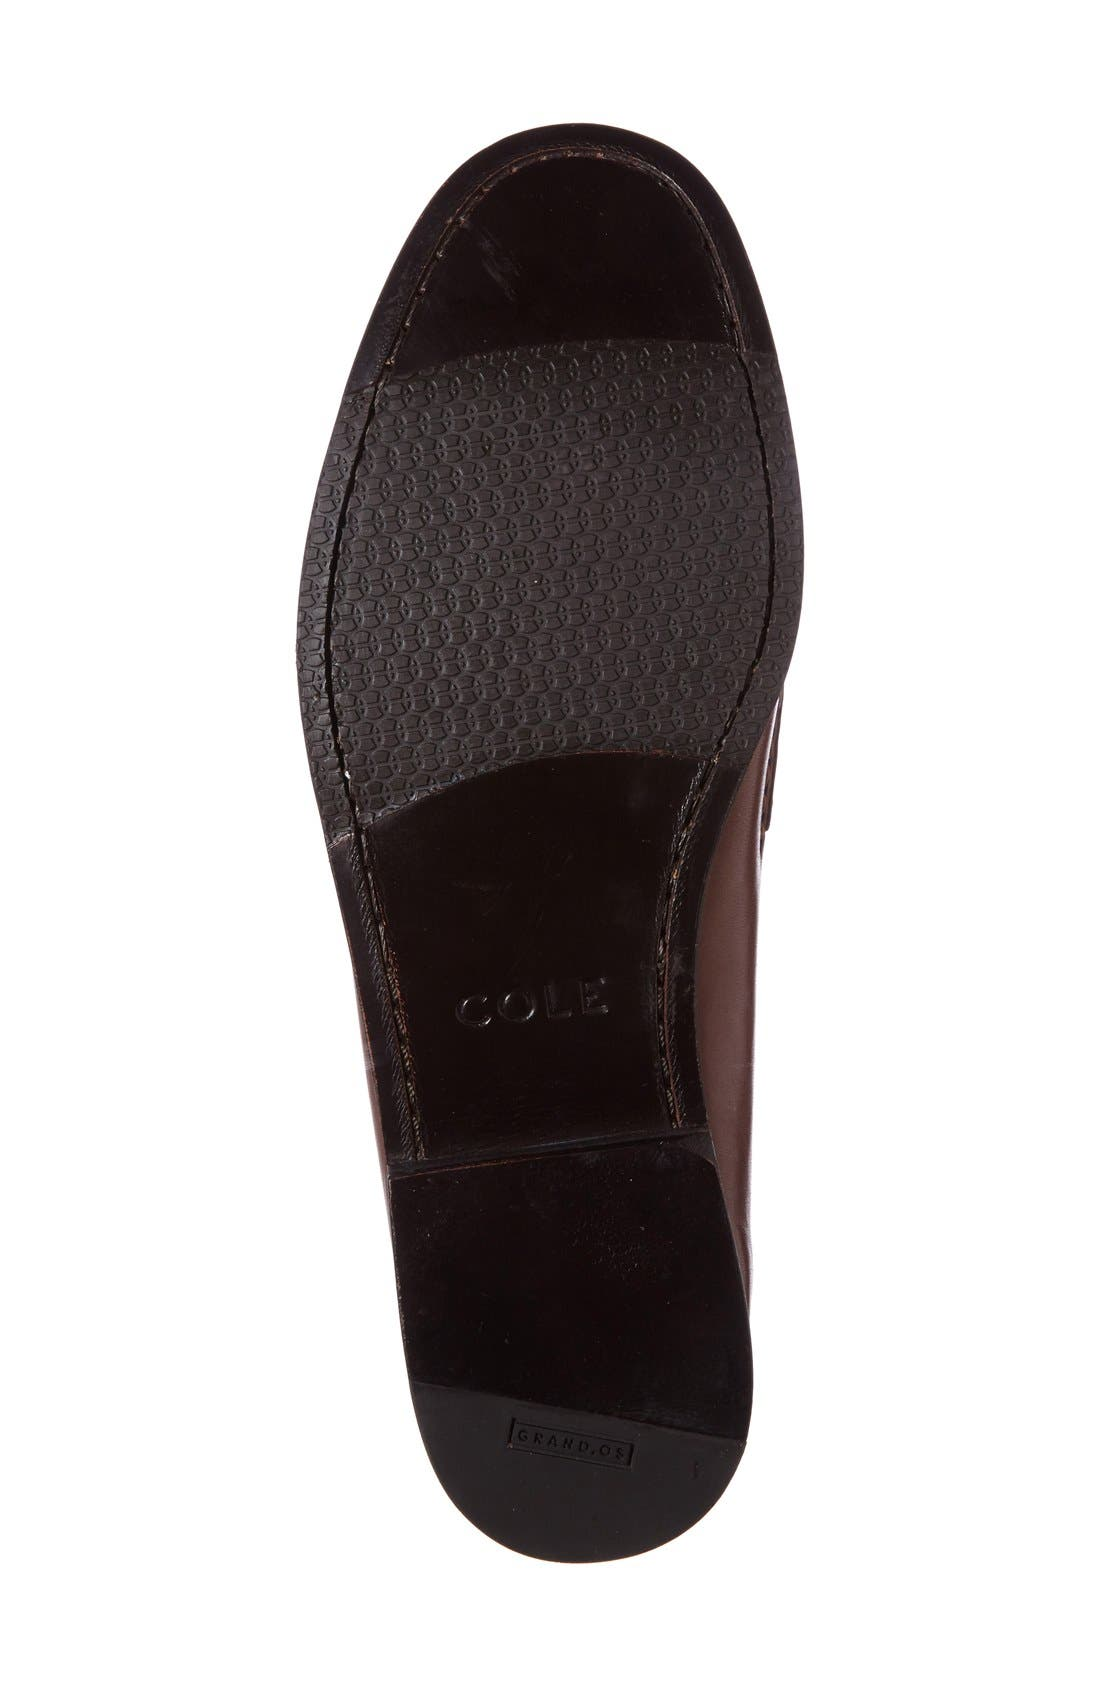 'Pinch Grand' Tassel Loafer,                             Alternate thumbnail 4, color,                             Papaya Leather